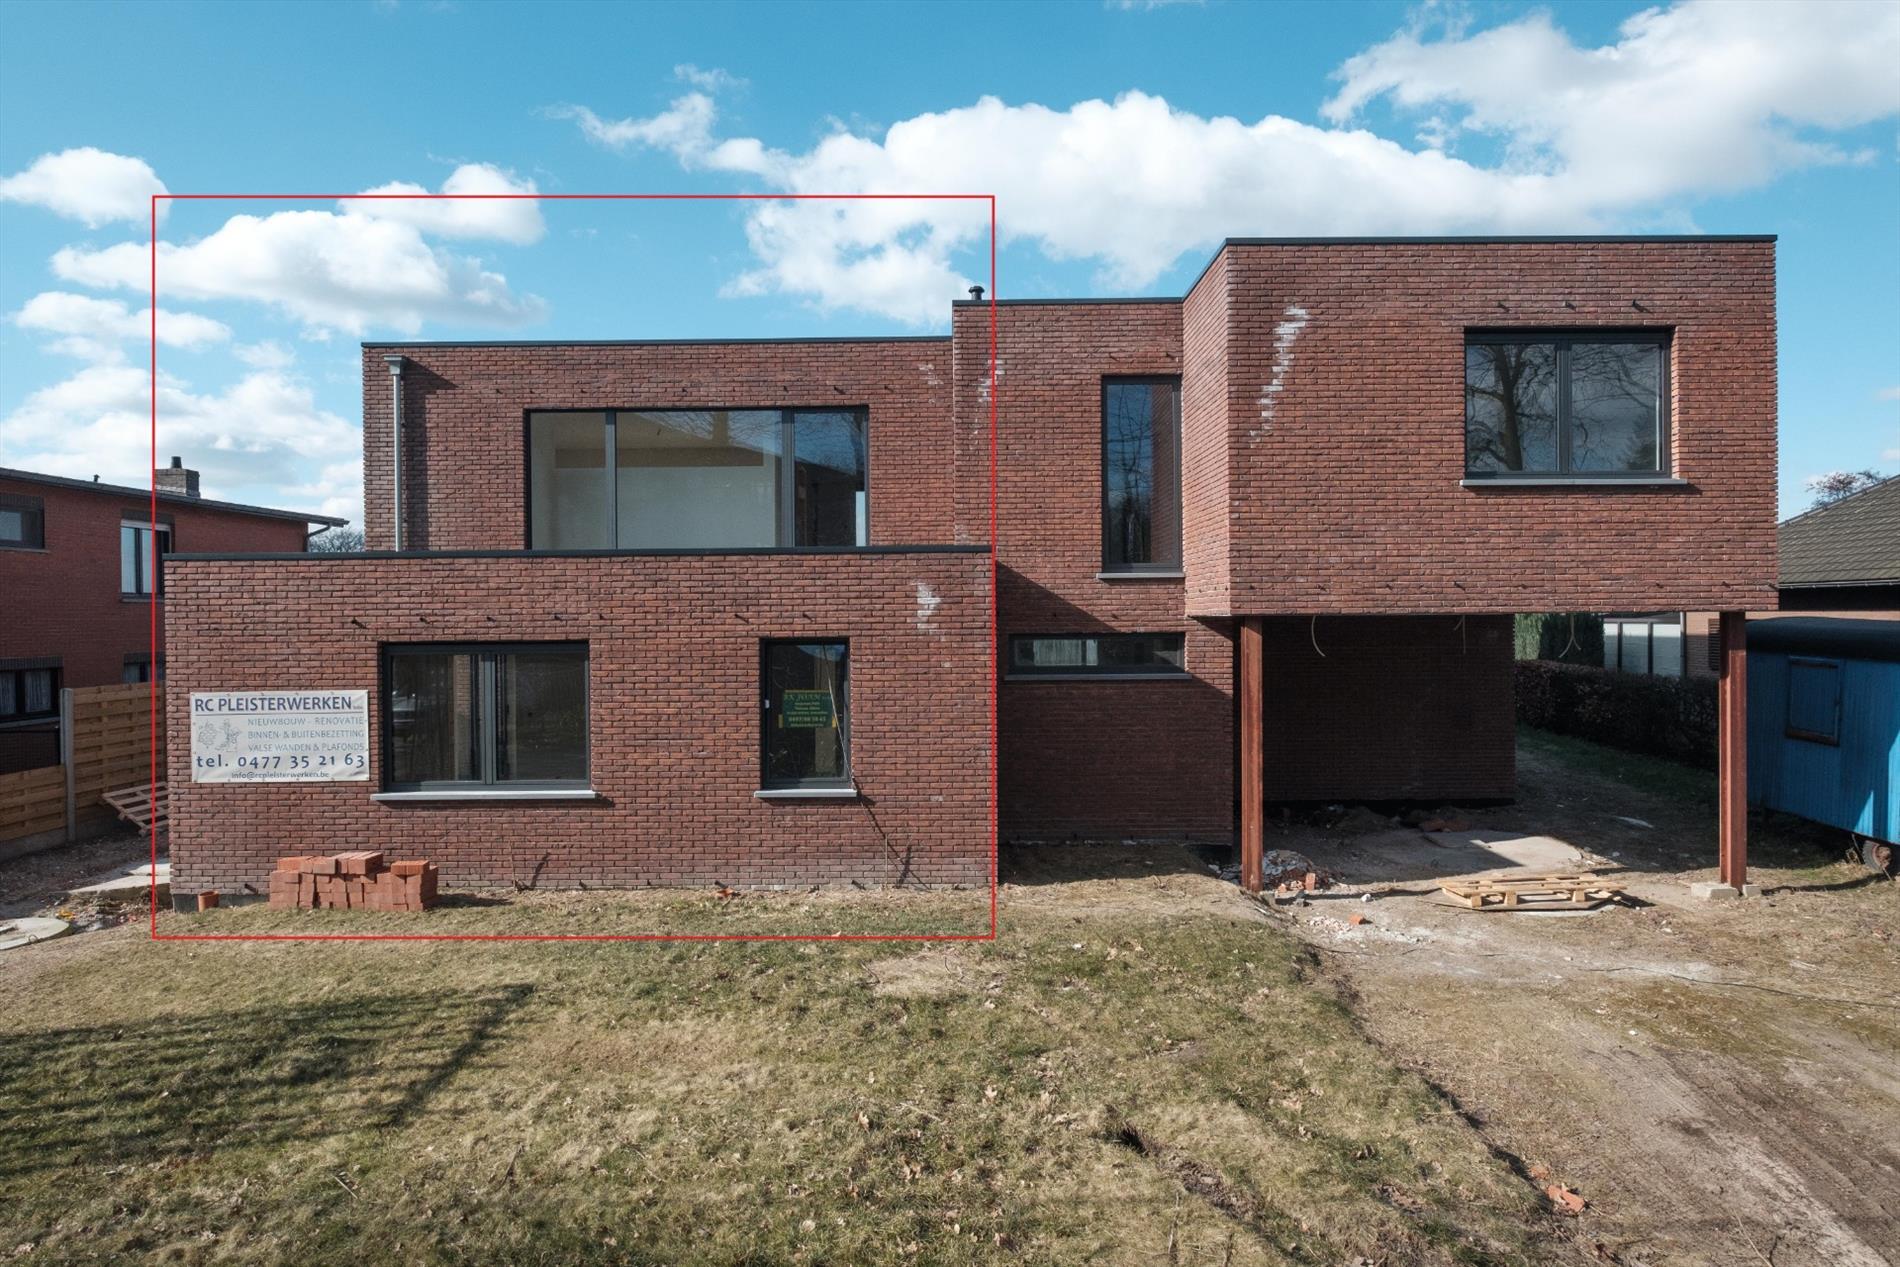 Stunning Hoogte Woonkamer Nieuwbouw Photos - Trend Ideas 2018 ...